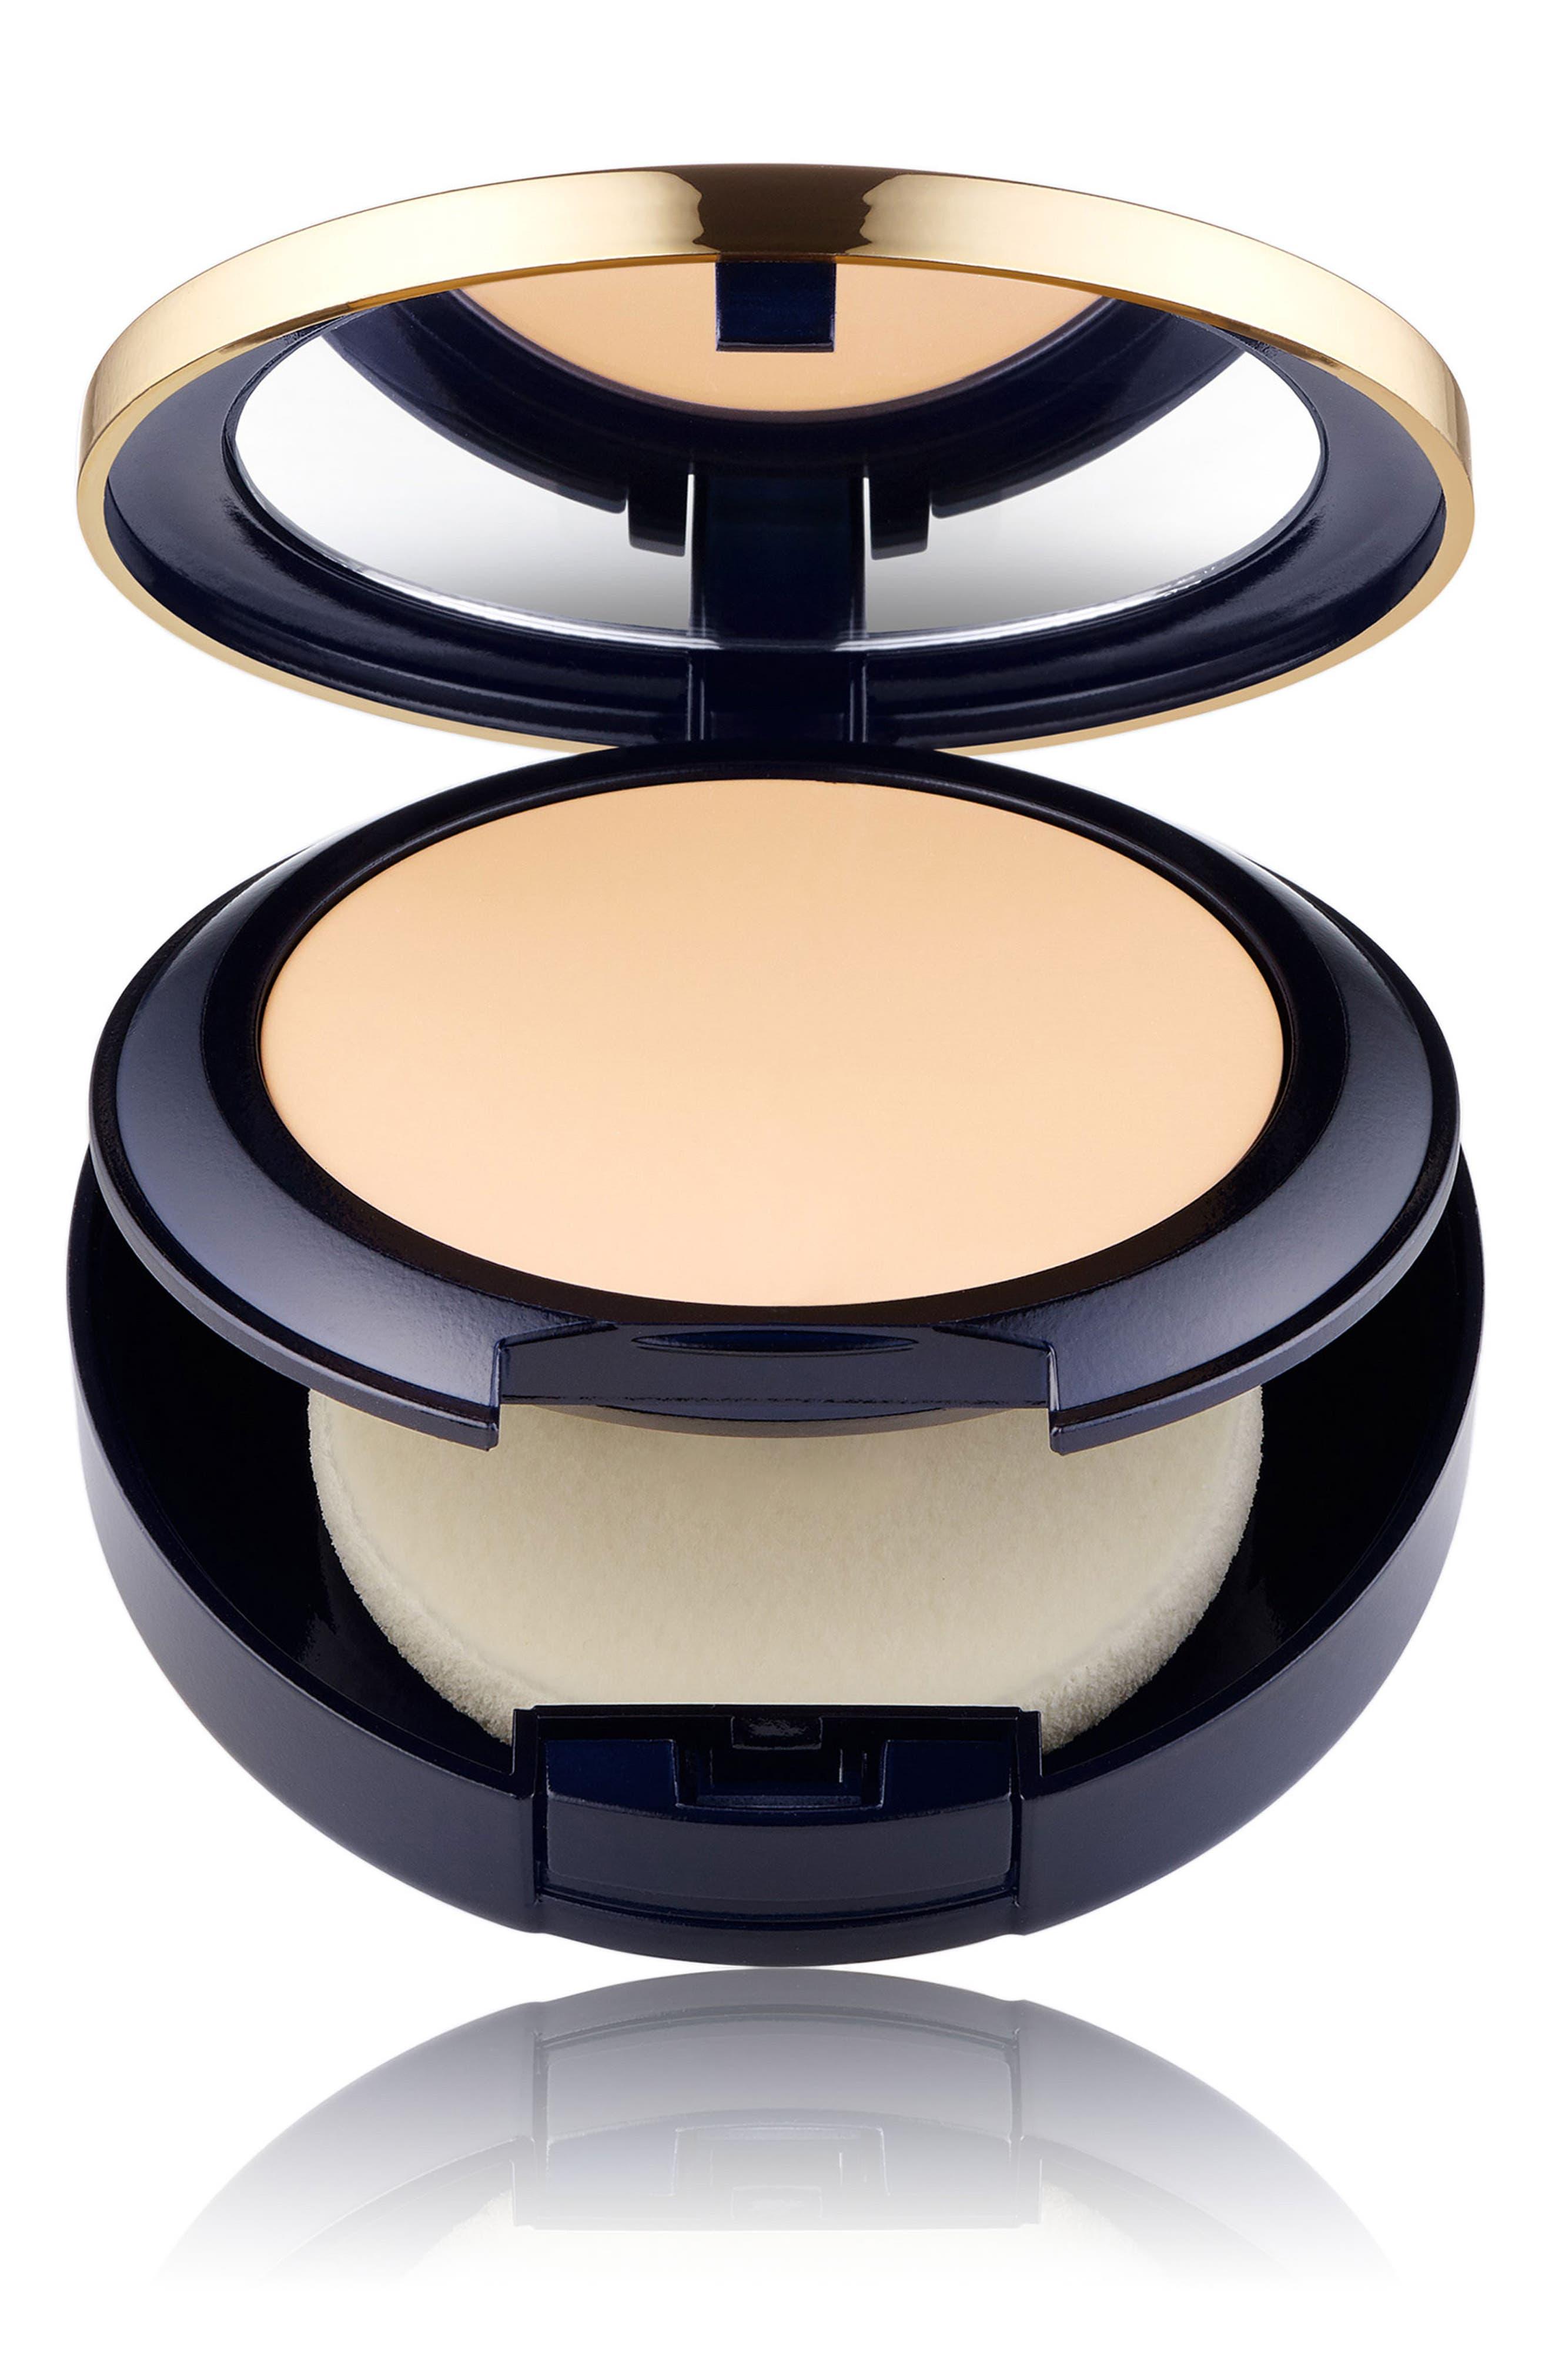 Estee Lauder Double Wear Stay In Place Matte Powder Foundation - 2C1 Pure Beige